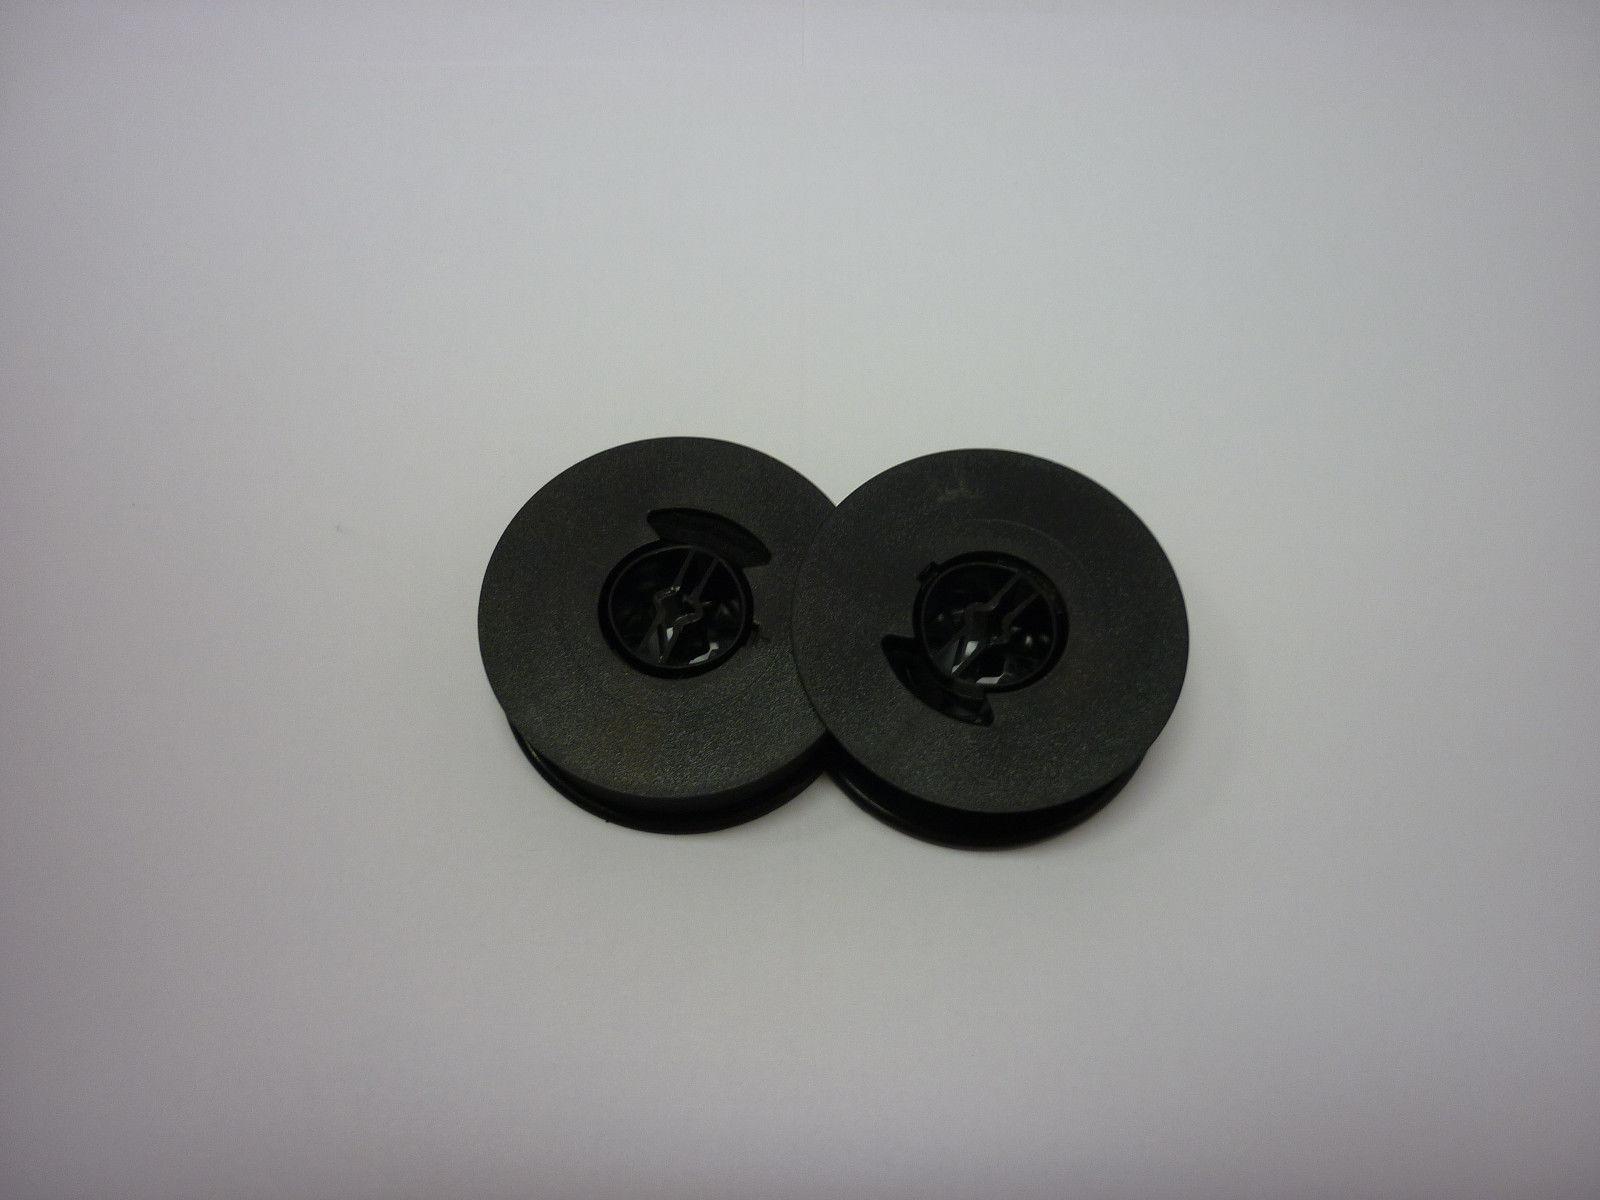 Olivetti Lettera 82 Lettera S14 Typewriter Ribbon Black and Red Twin Spool